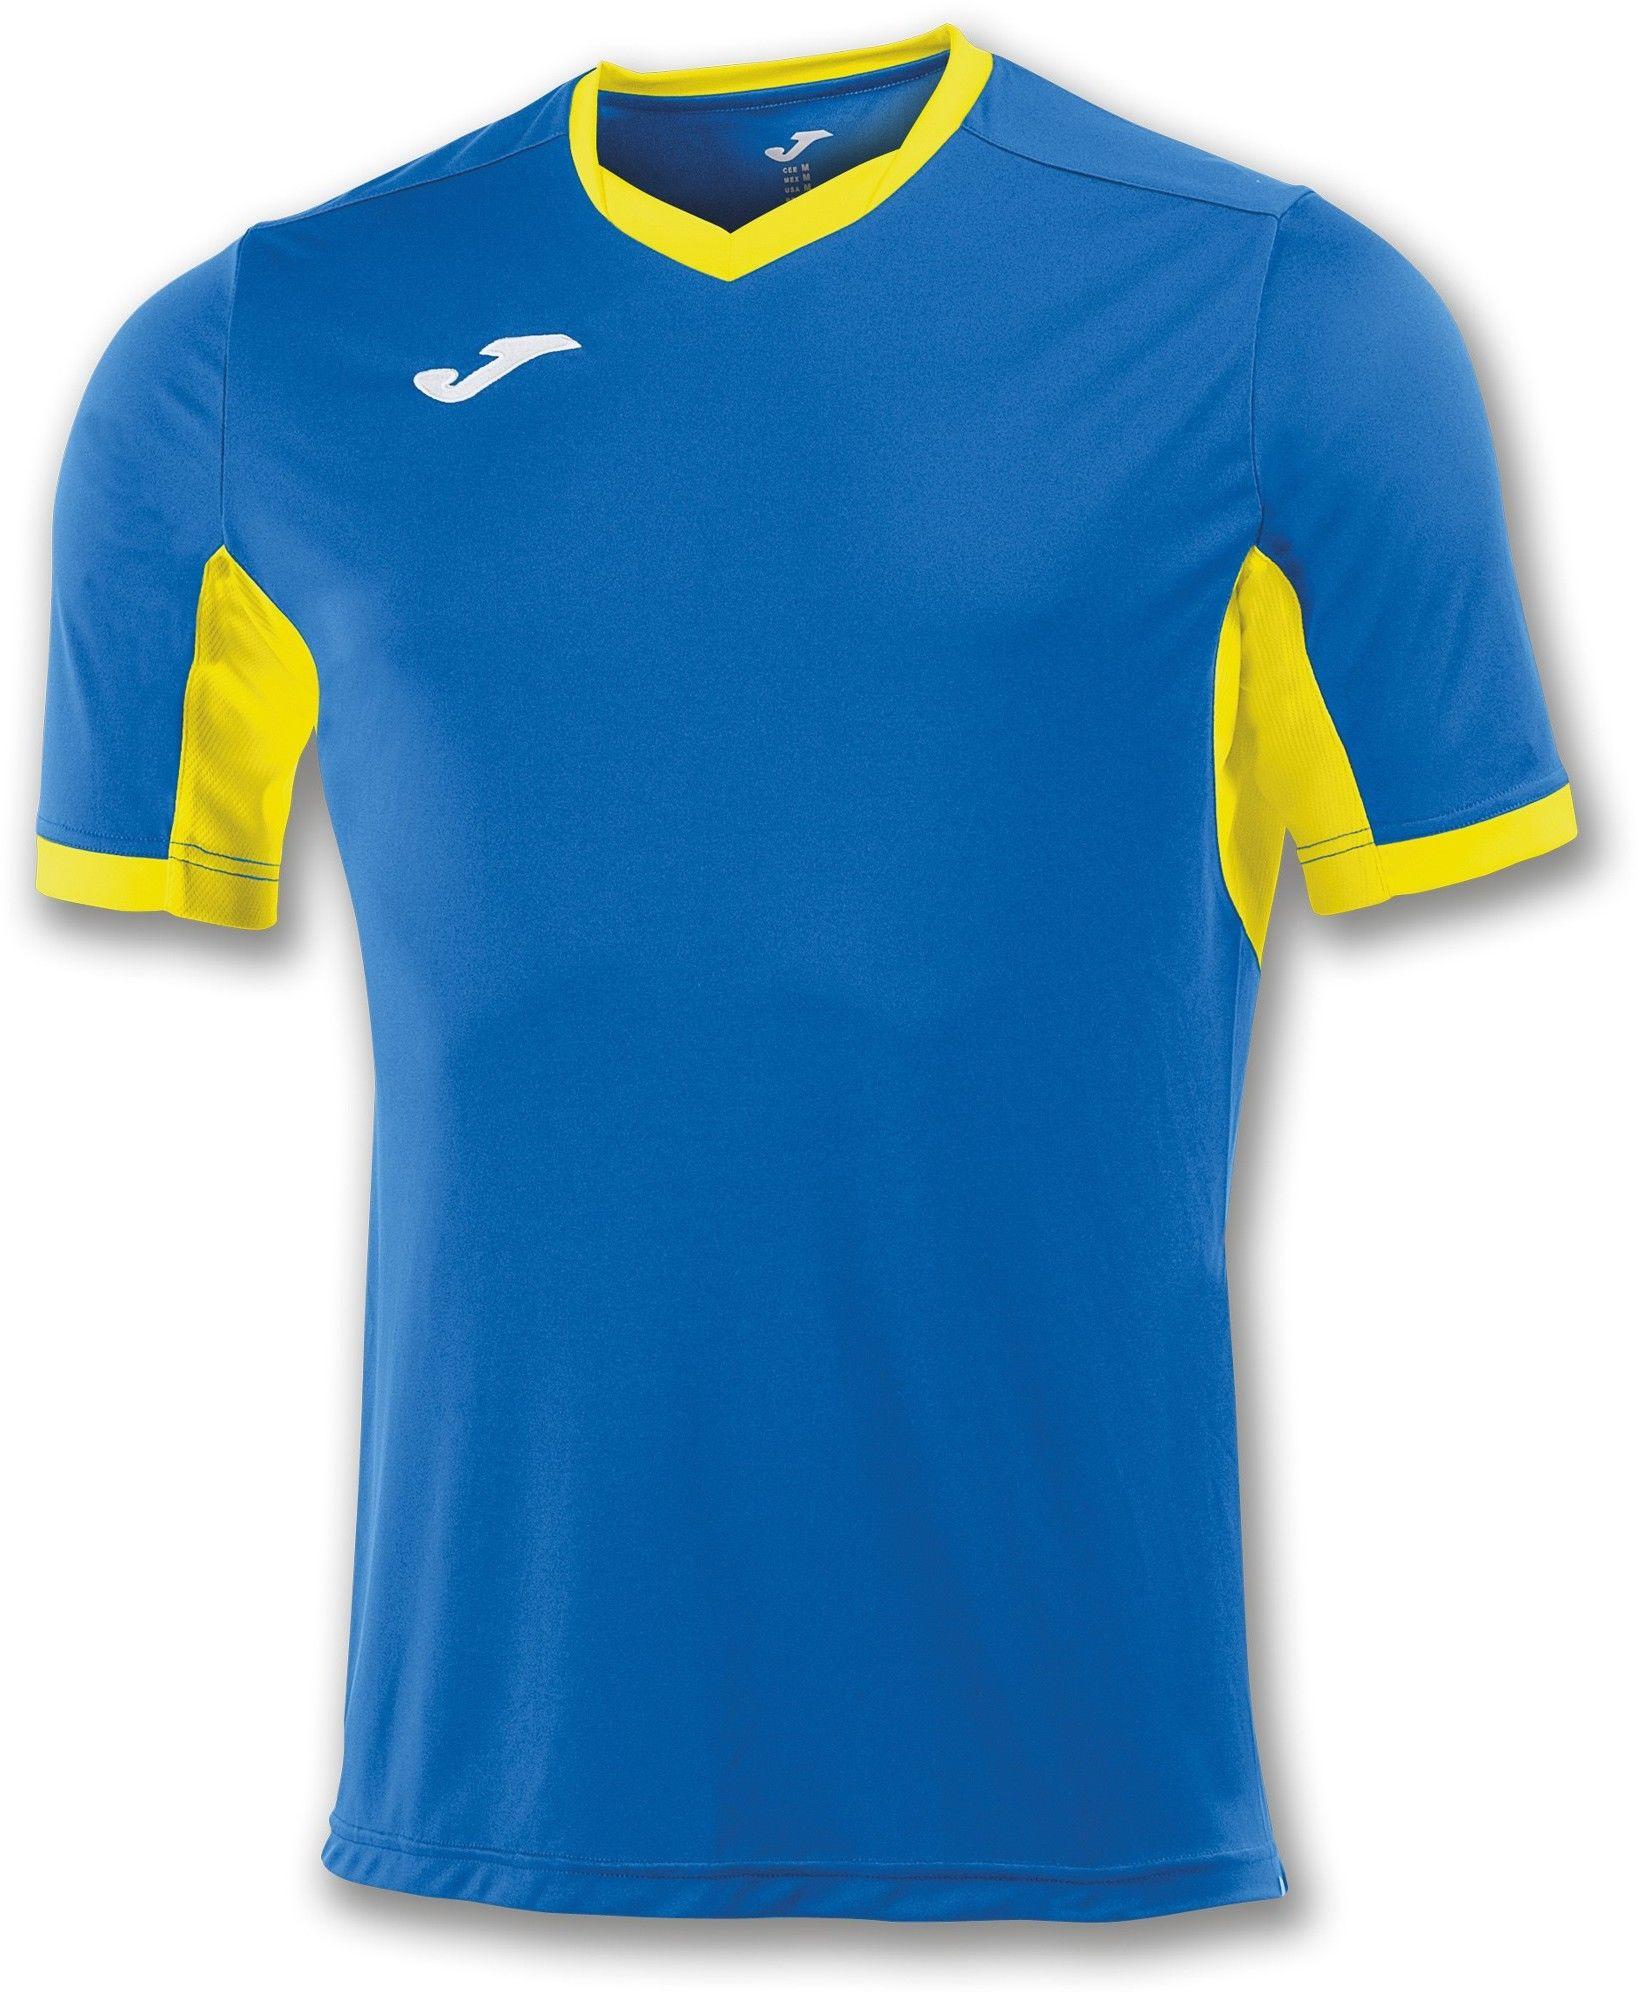 Koszulka Joma Champion IV royal/yellow (10 szt.)